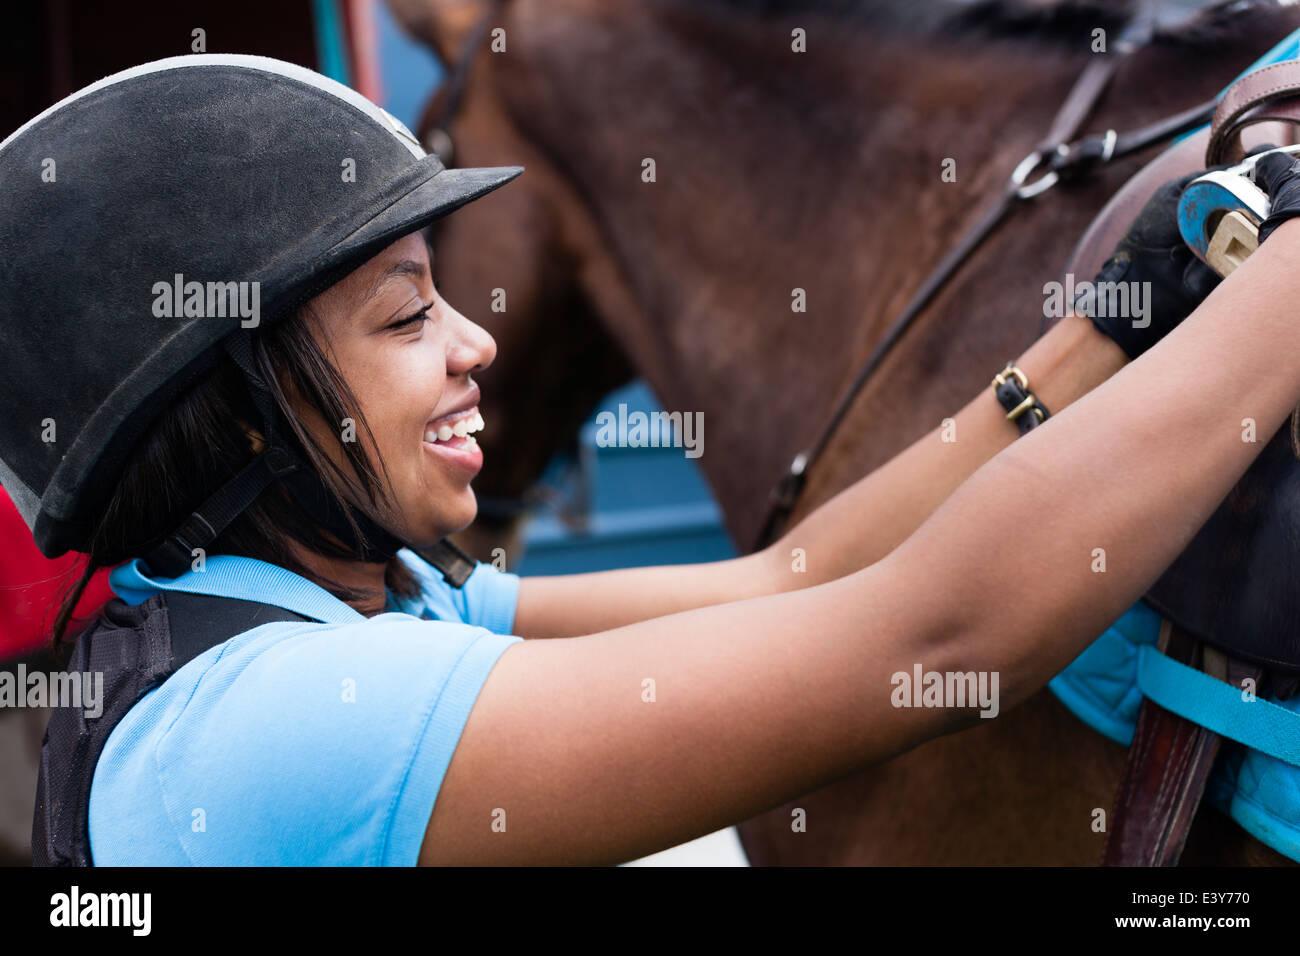 Cerca de joven poniendo sillin a caballo. Imagen De Stock